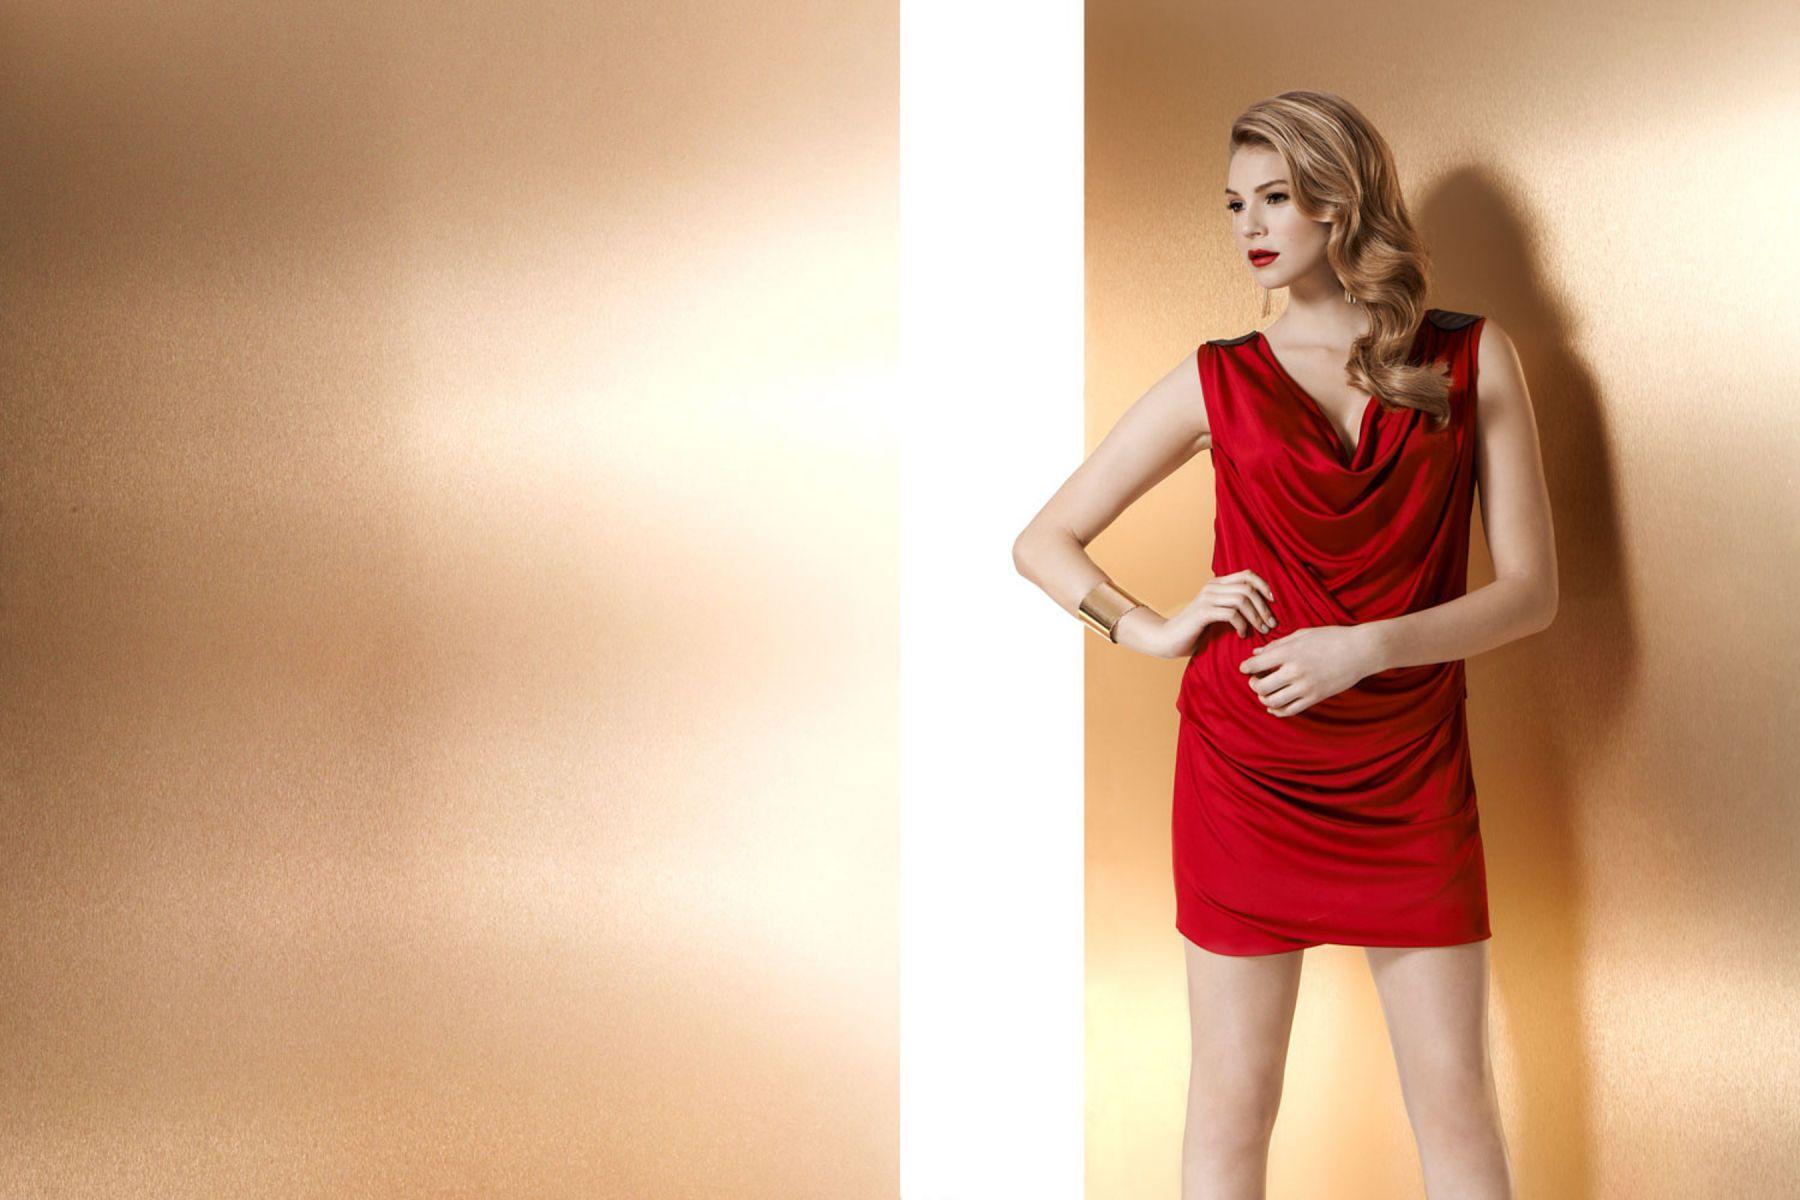 1s14_fw13_red_goddessdresseditorial_1474r1_copy.jpg